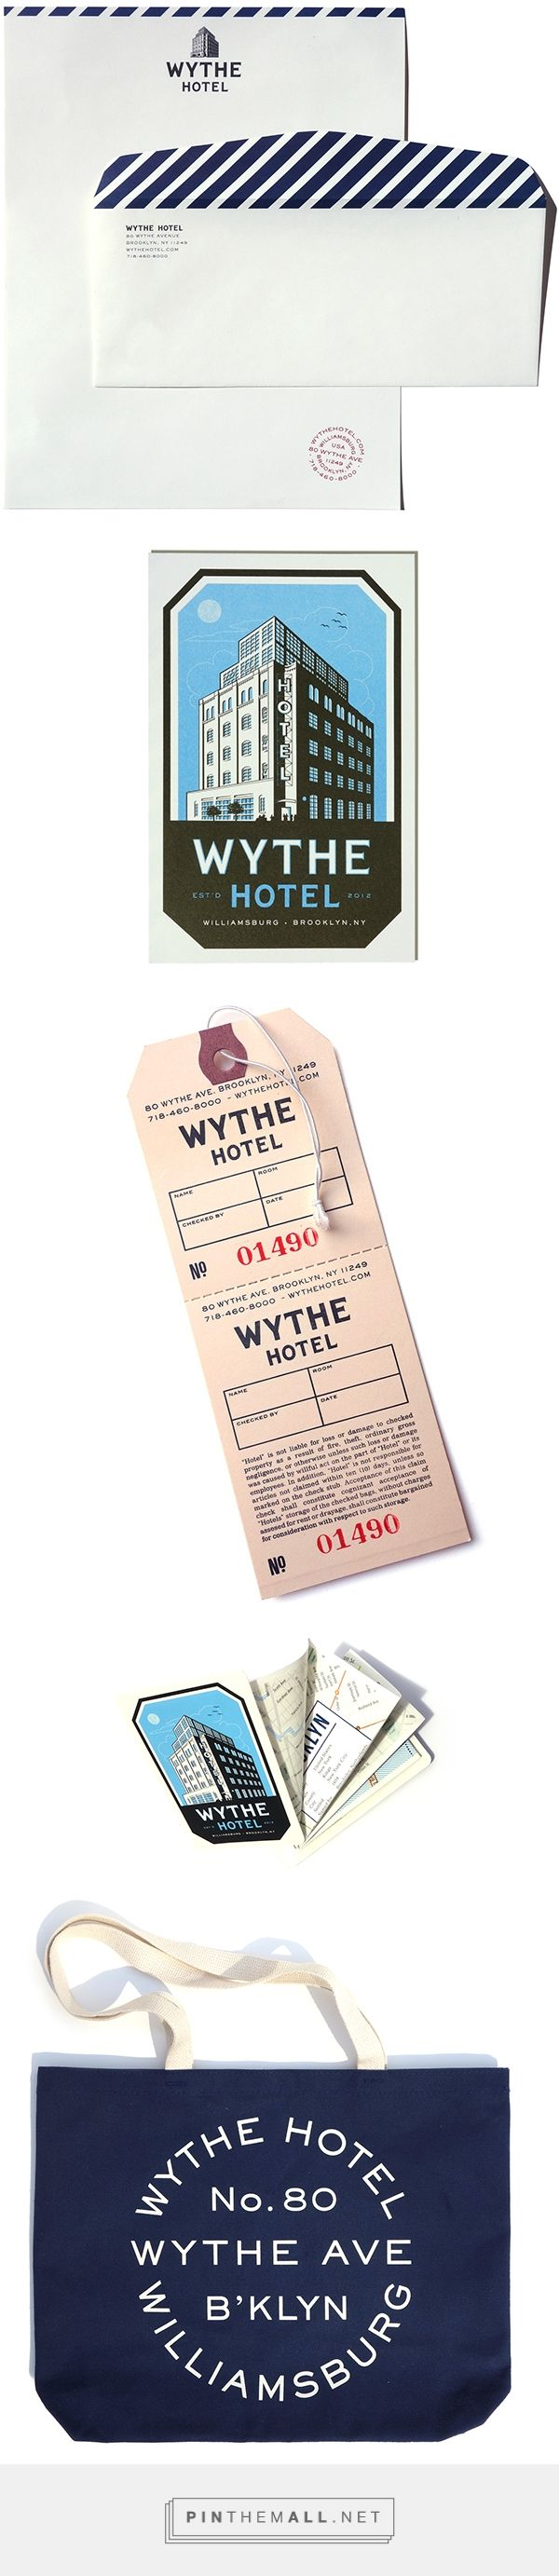 Wythe Hotel Branding by Derick Holt